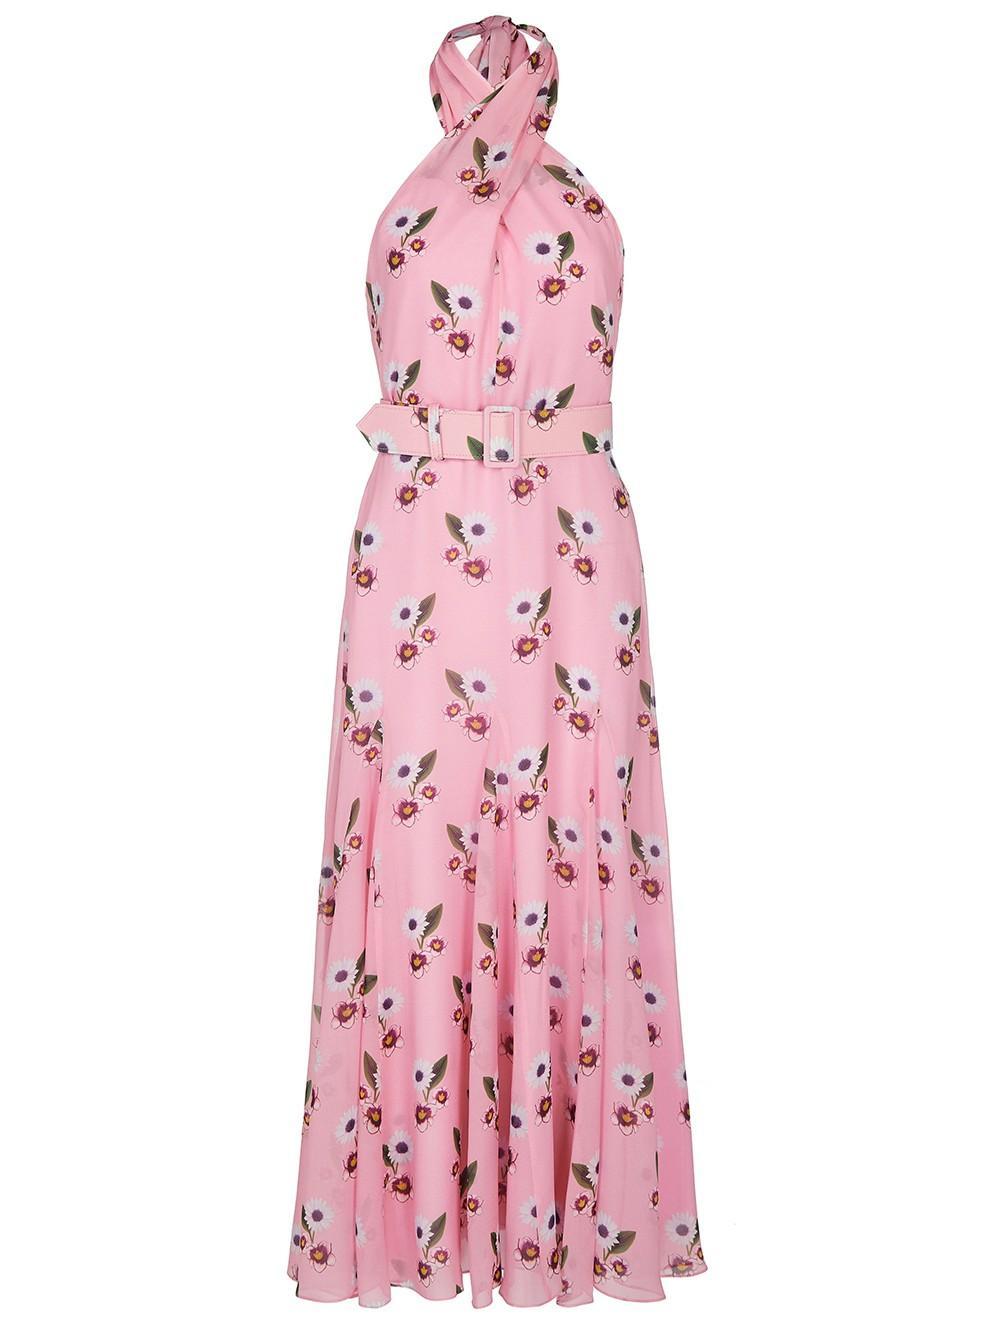 Zora Rose Print Dress